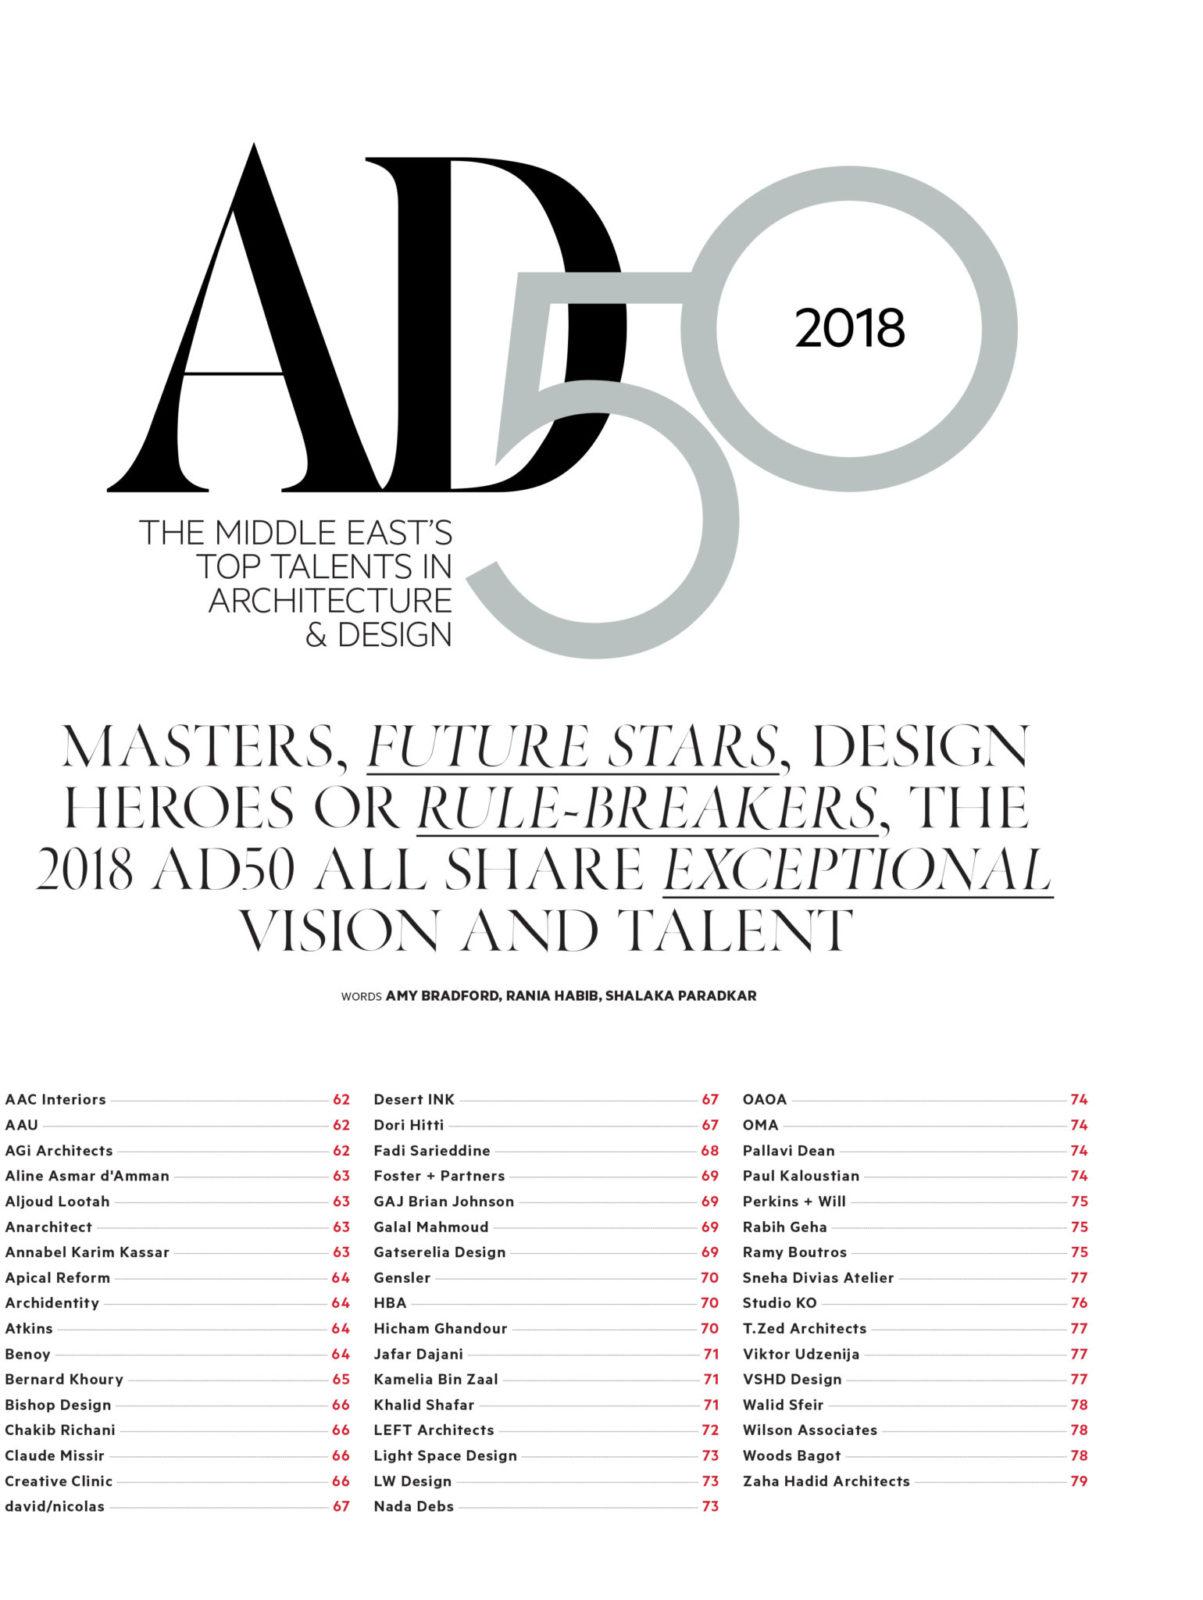 Sneha Divias Atelier -Architectural Digest AD50